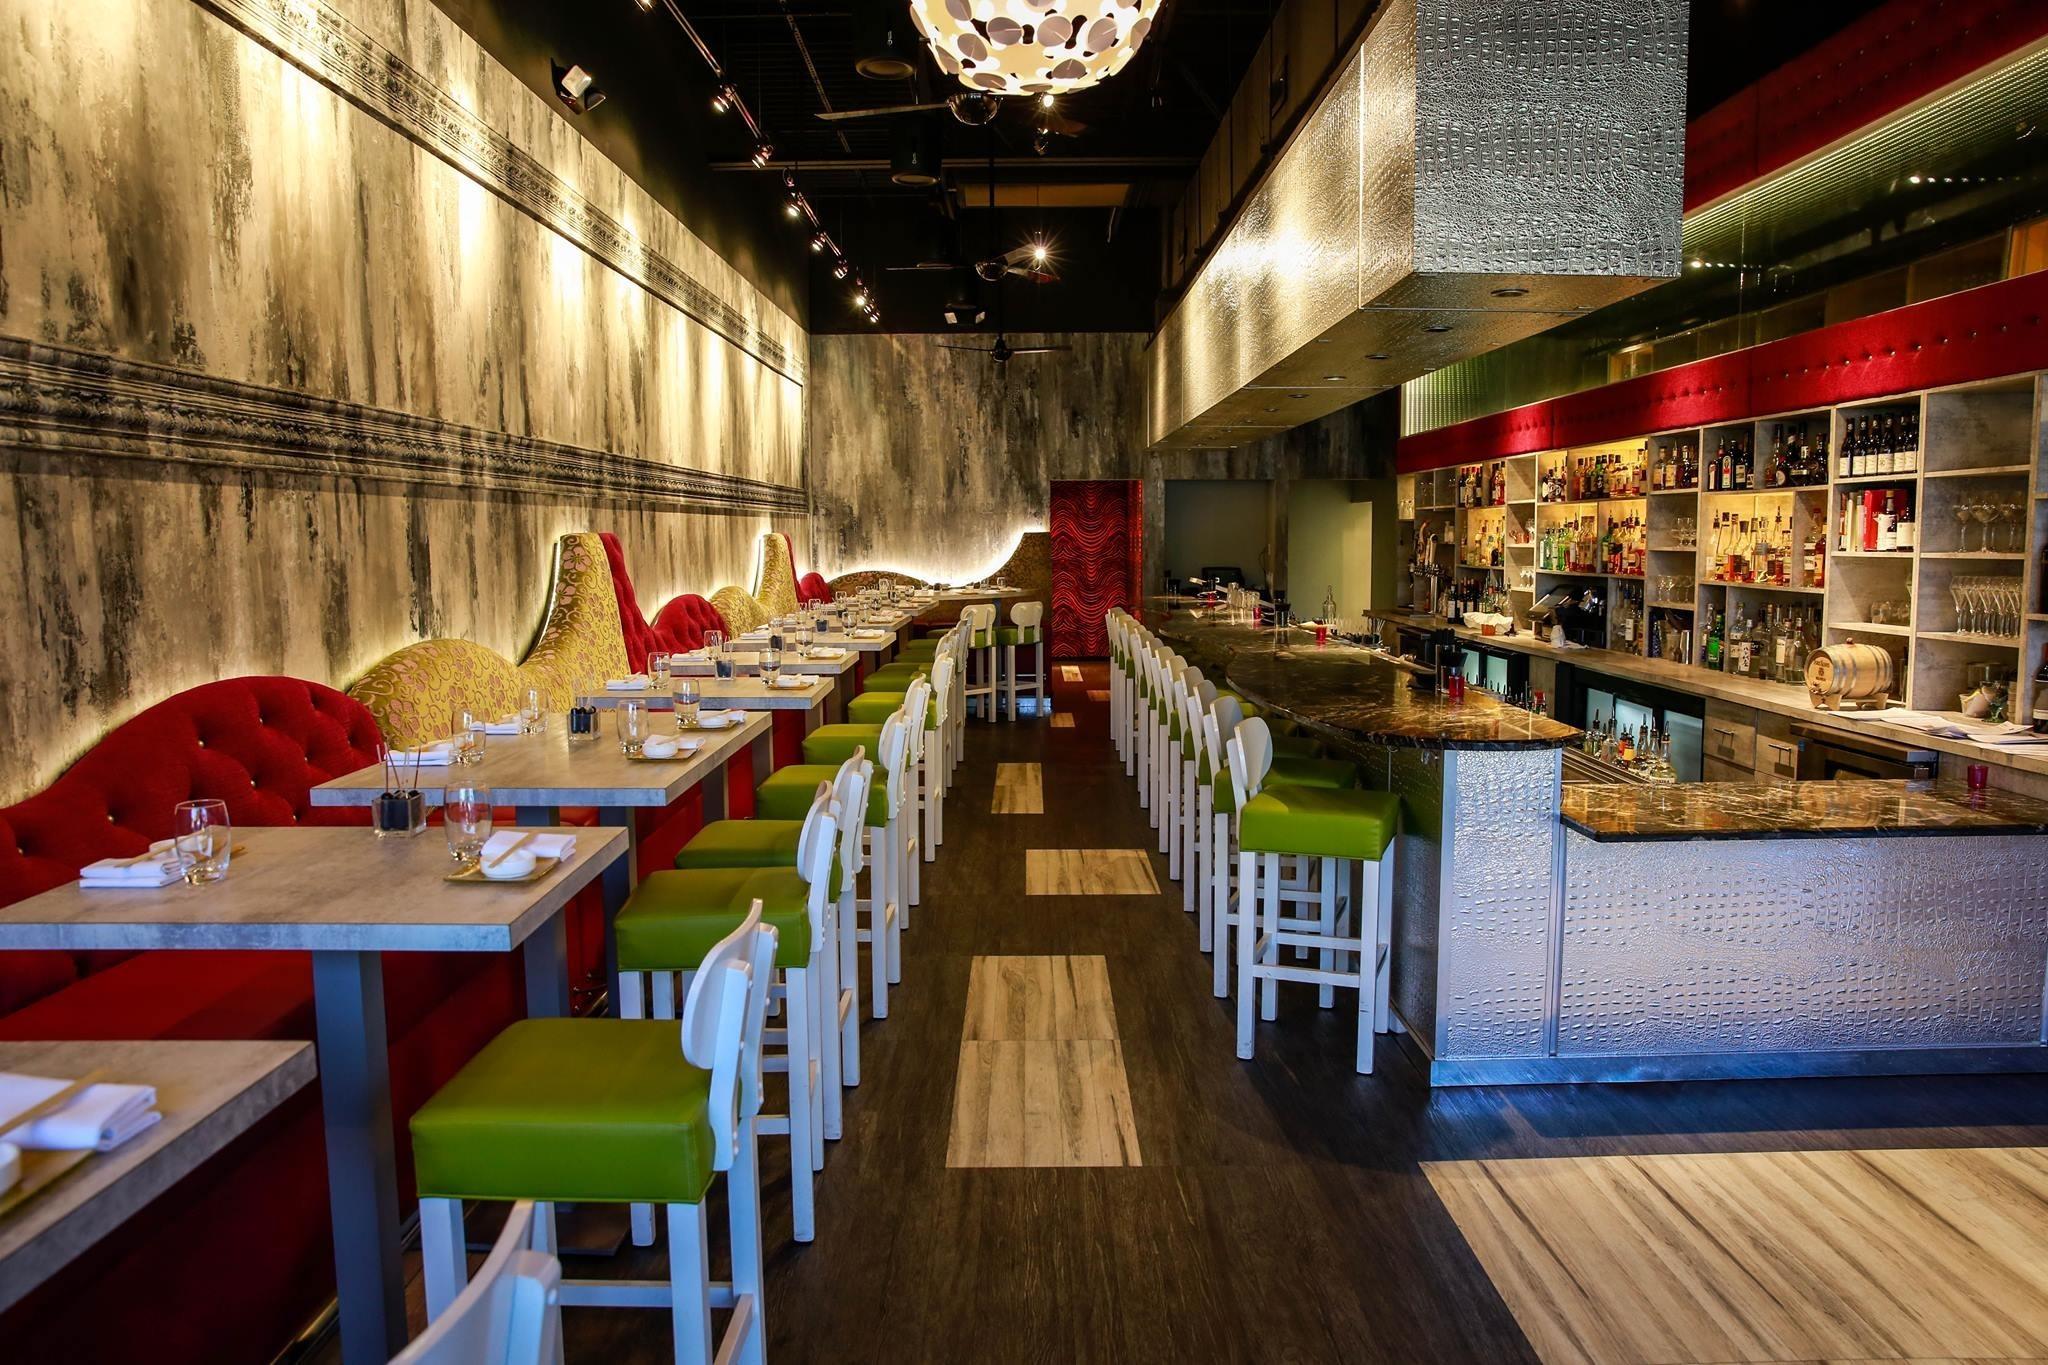 Winter Park S Sushi Pop To Feature Vietnamese Pop Up